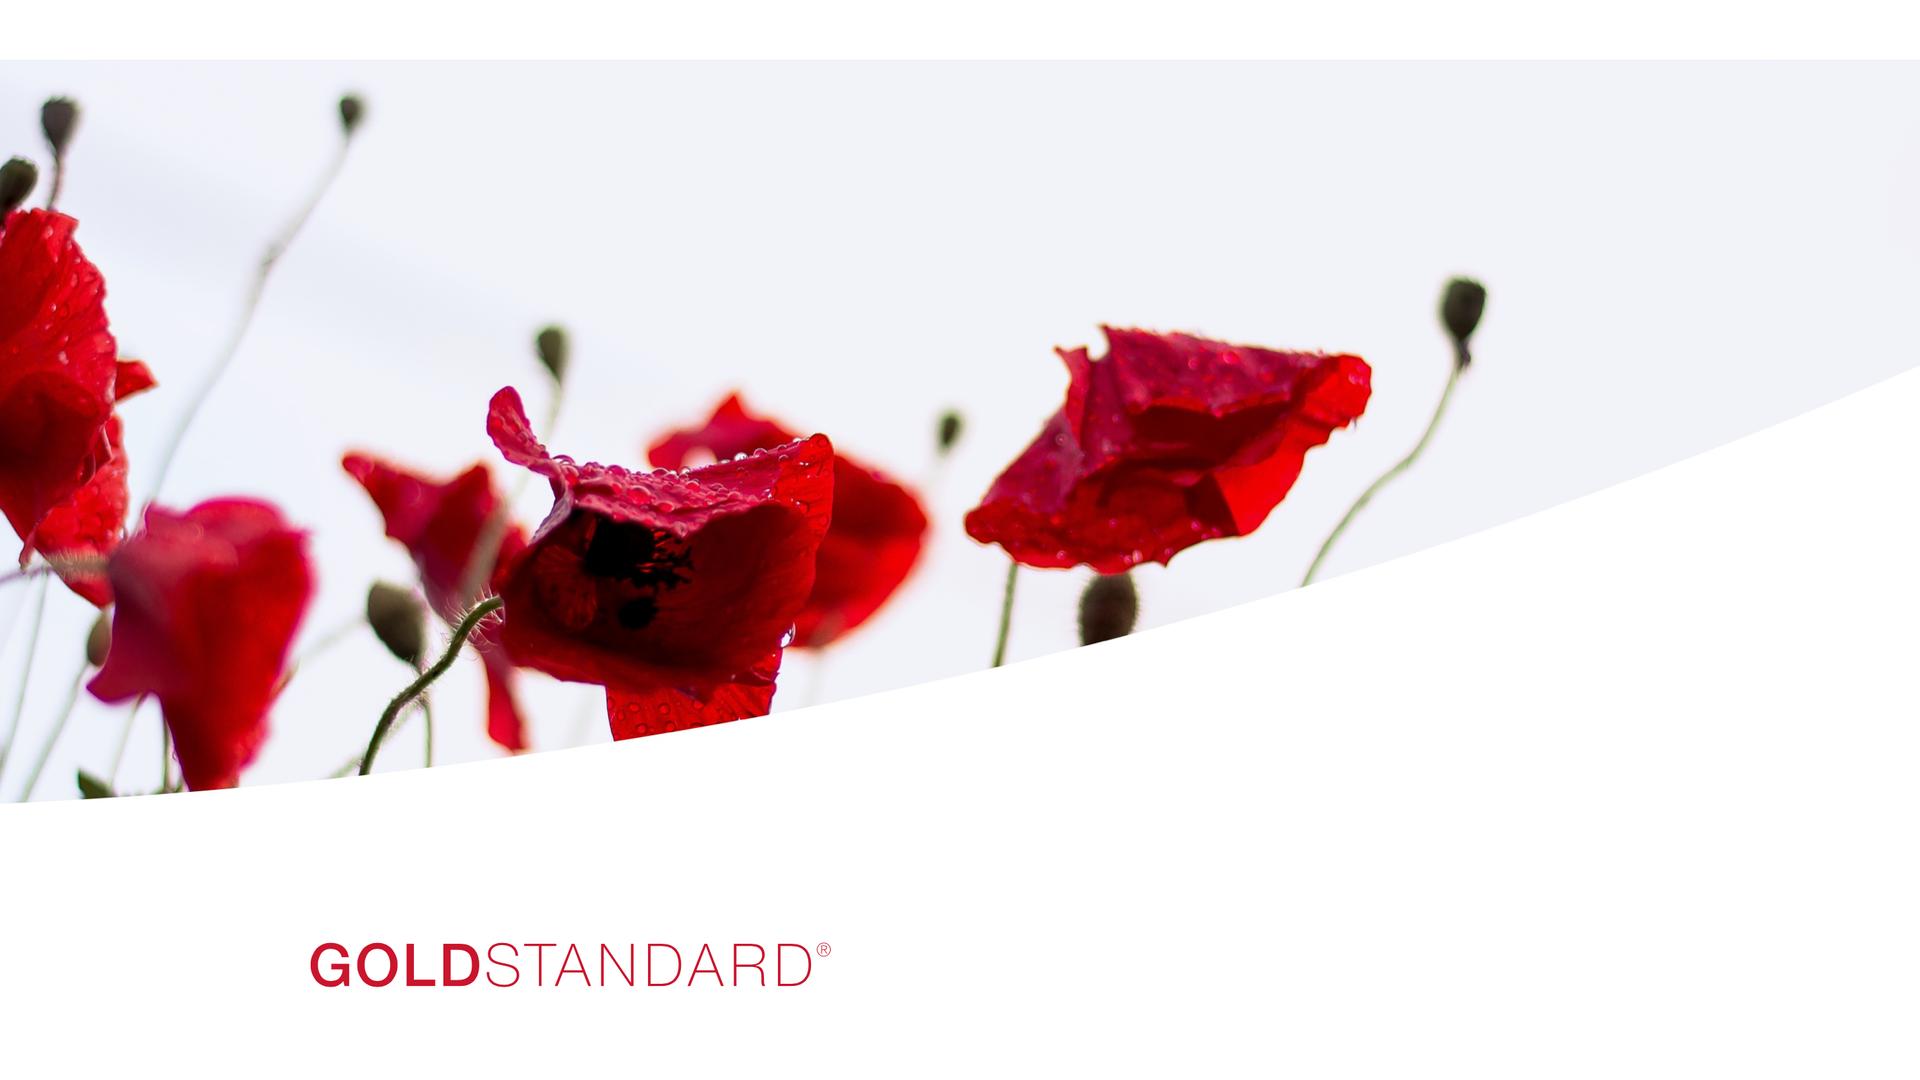 Goldstandard Website